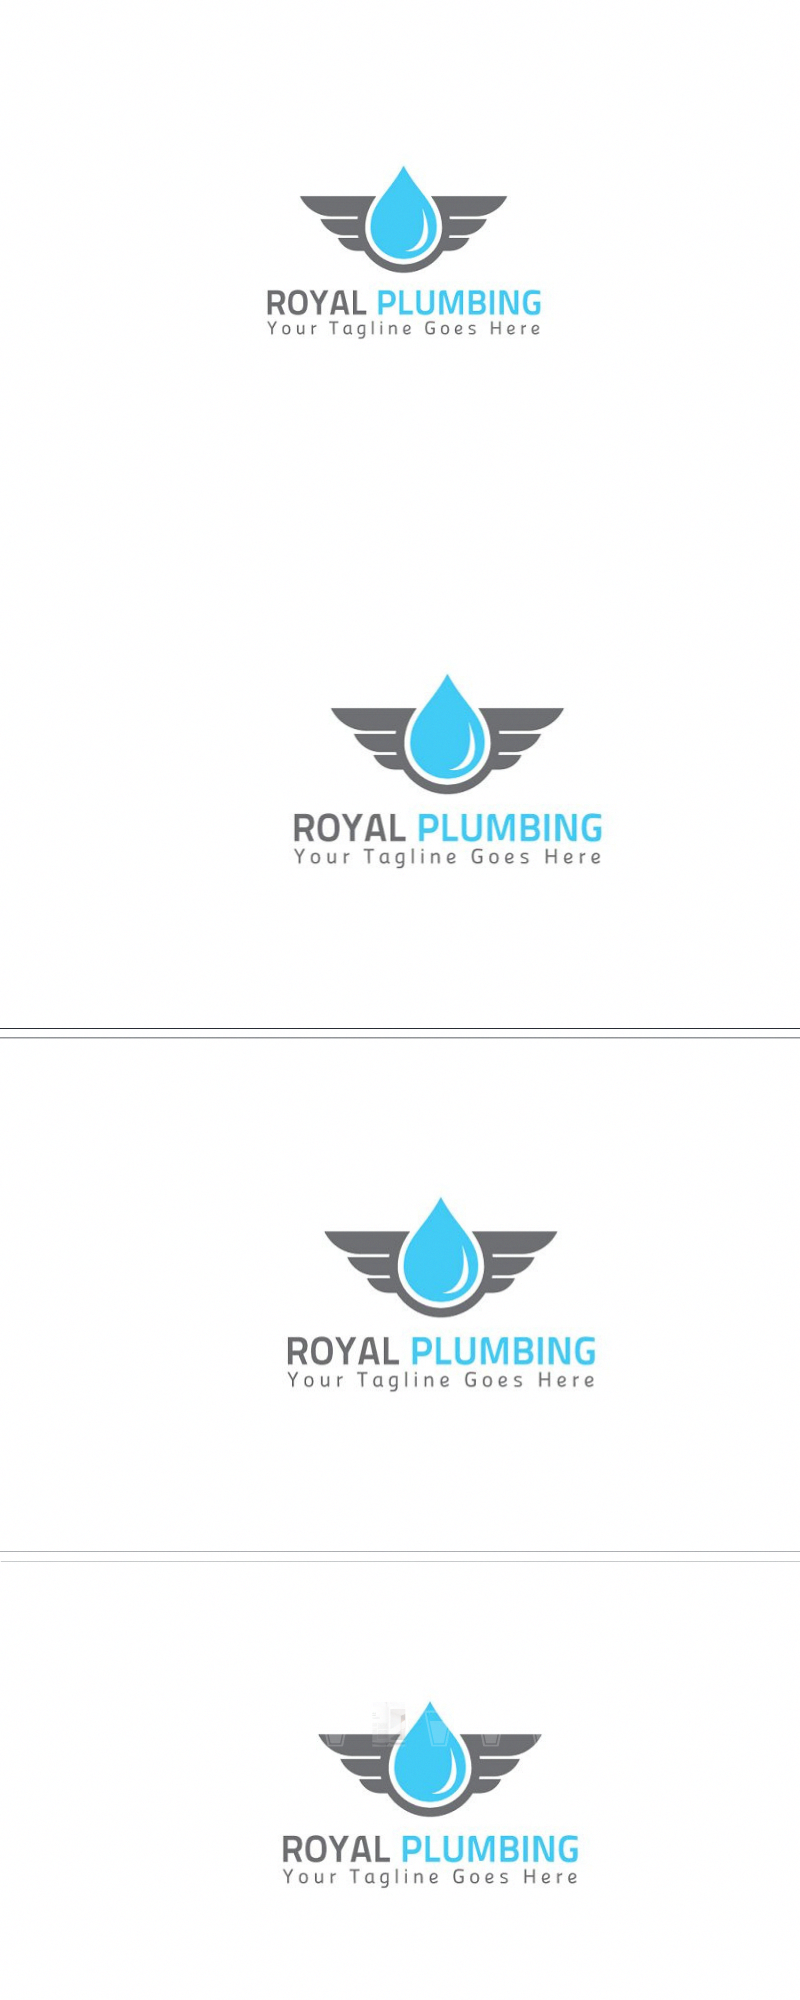 Plumbing Grimsby  Plumbing Supplies Uk  Lauderbach